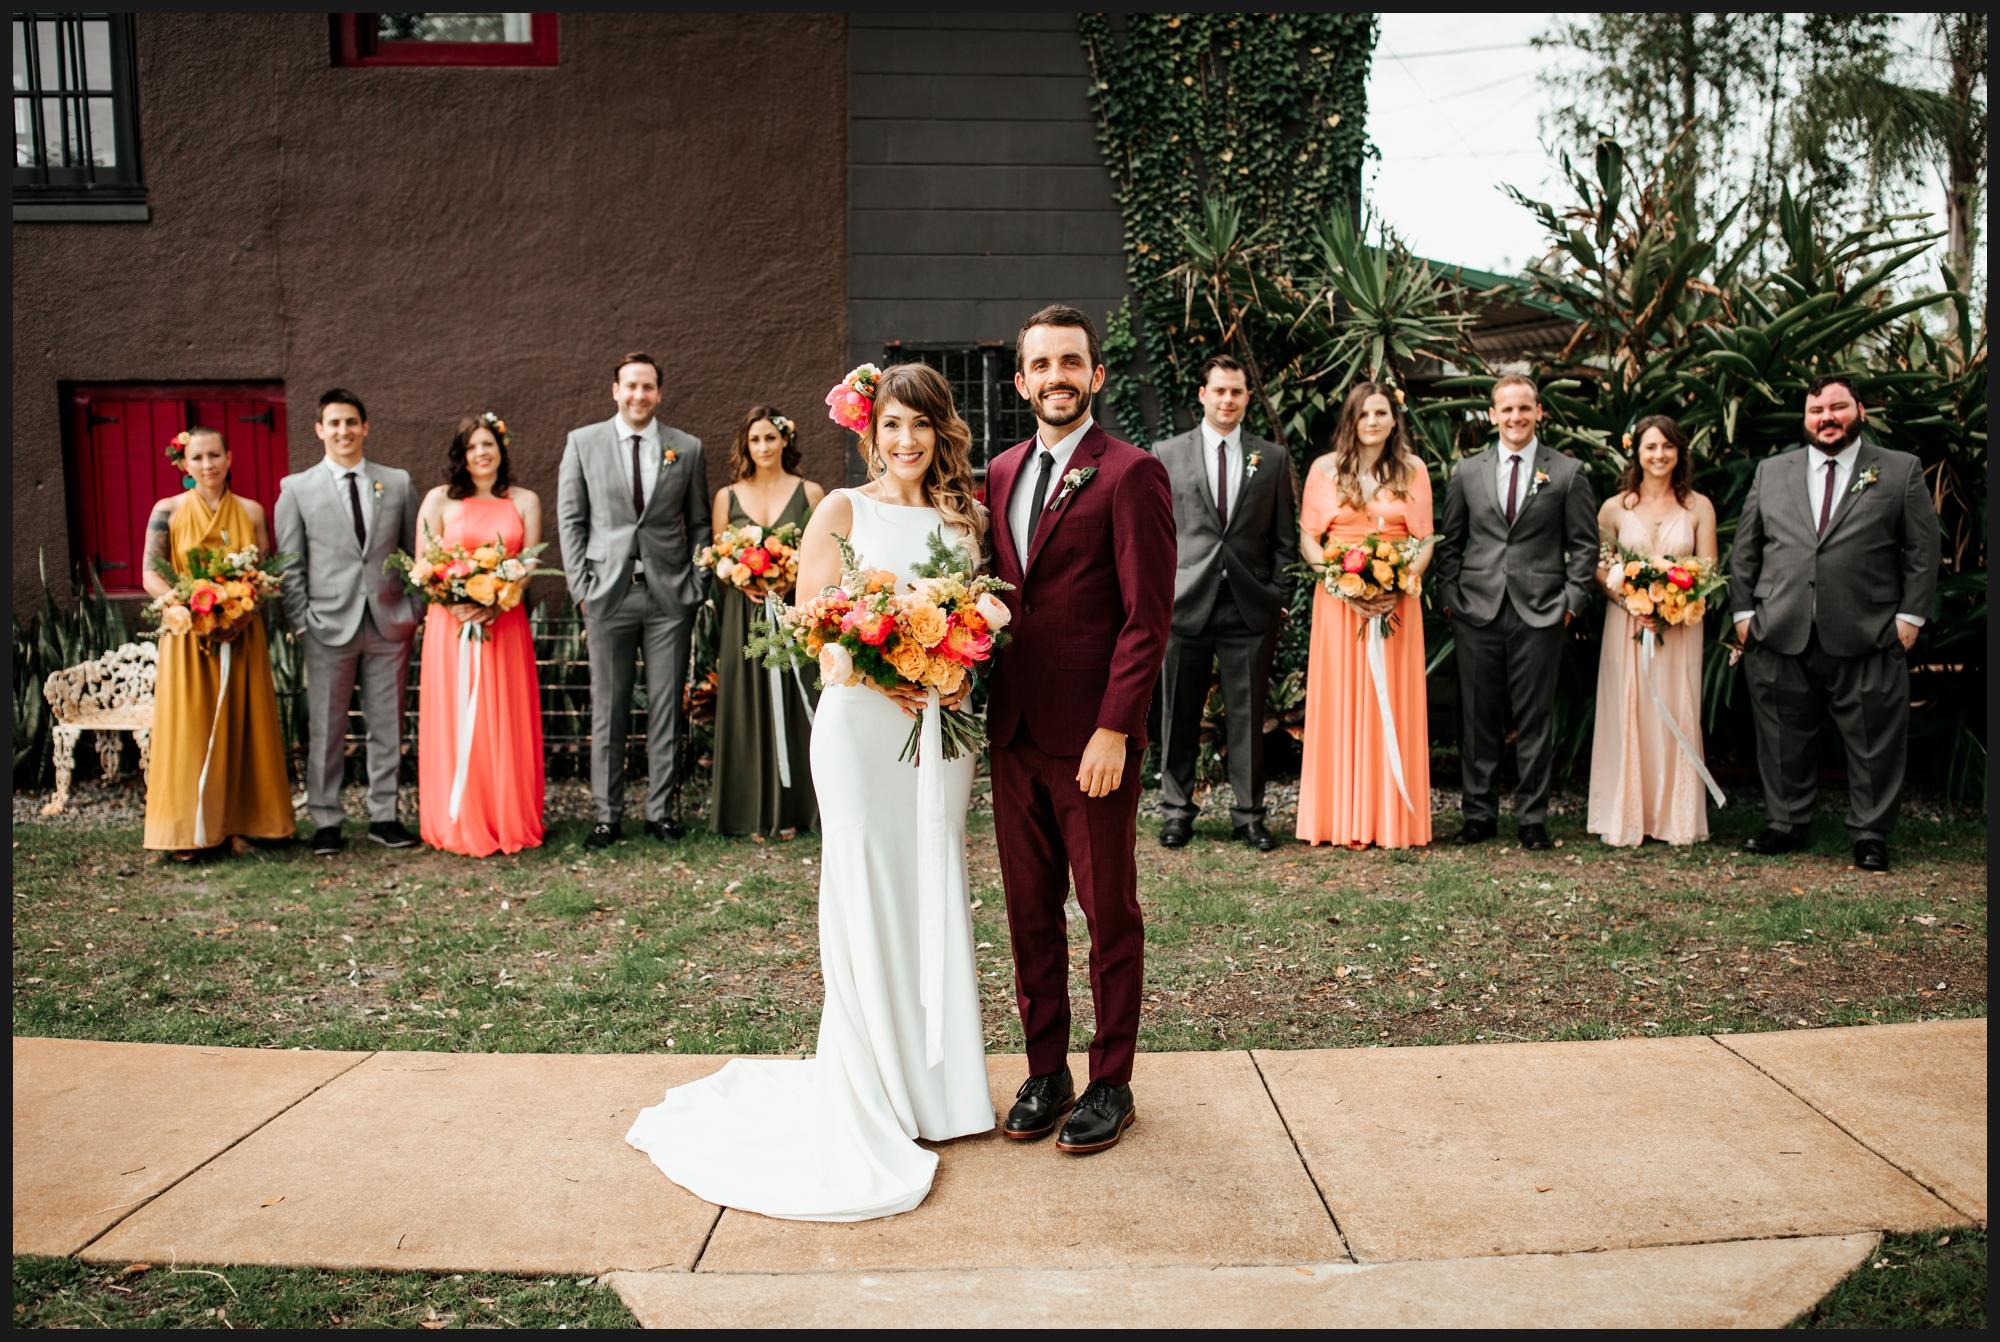 Orlando-Wedding-Photographer-destination-wedding-photographer-florida-wedding-photographer-bohemian-wedding-photographer_1976.jpg